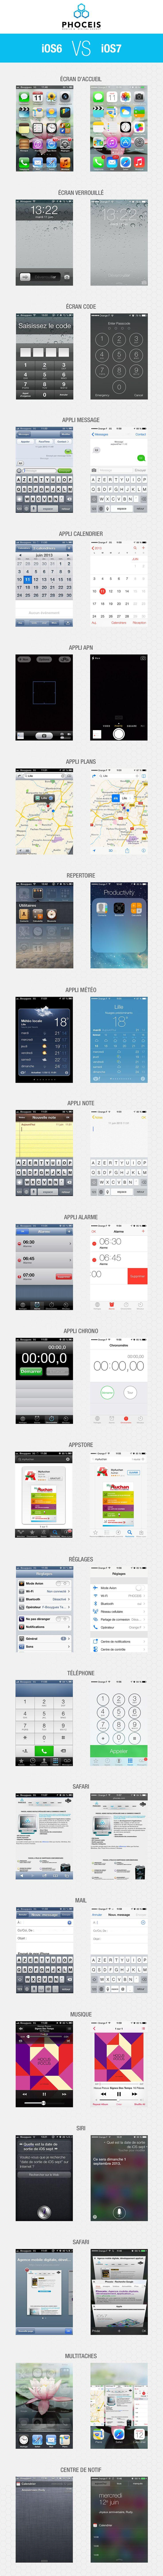 #Infographie Front end iOS6 versus iOS7 via Phoceis